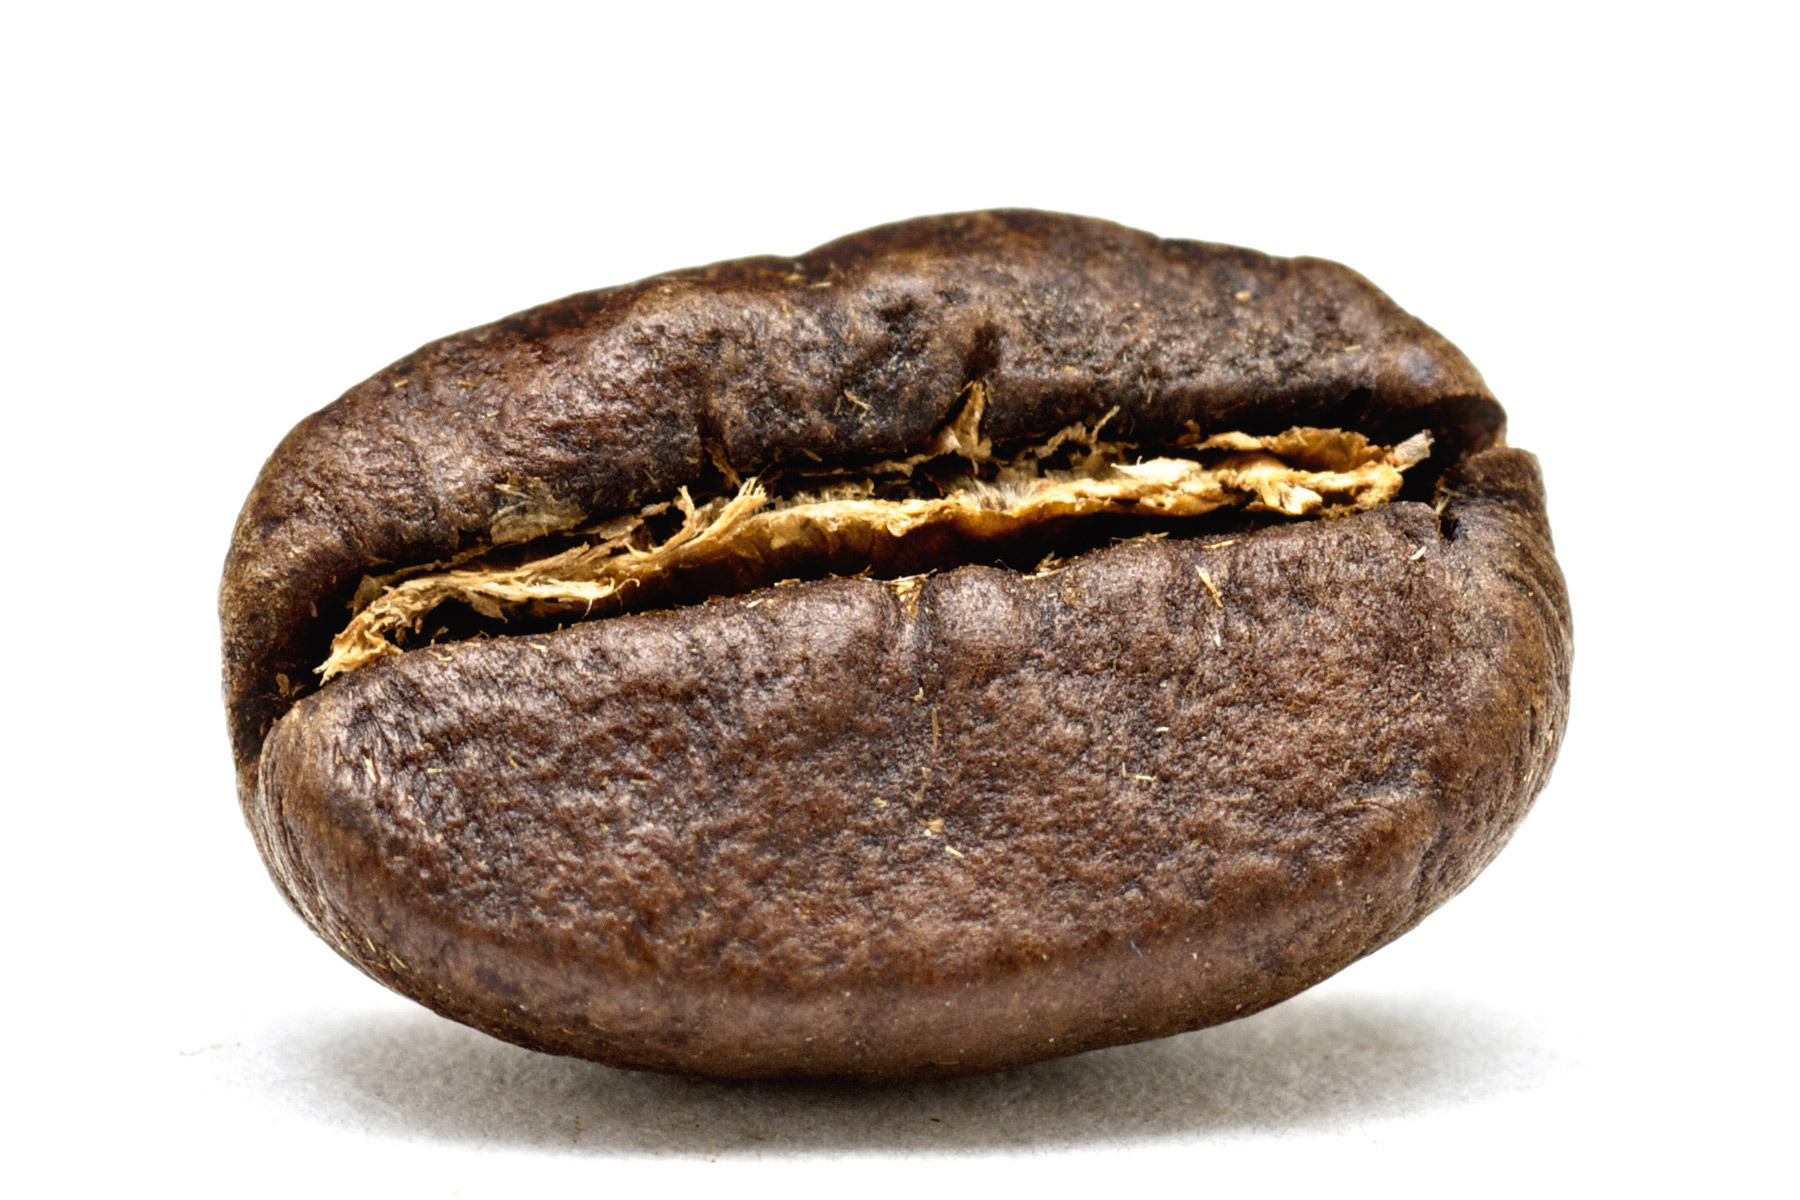 http://www.11roasters.com/data/photos/15_1kenya_coffee_bean.jpg